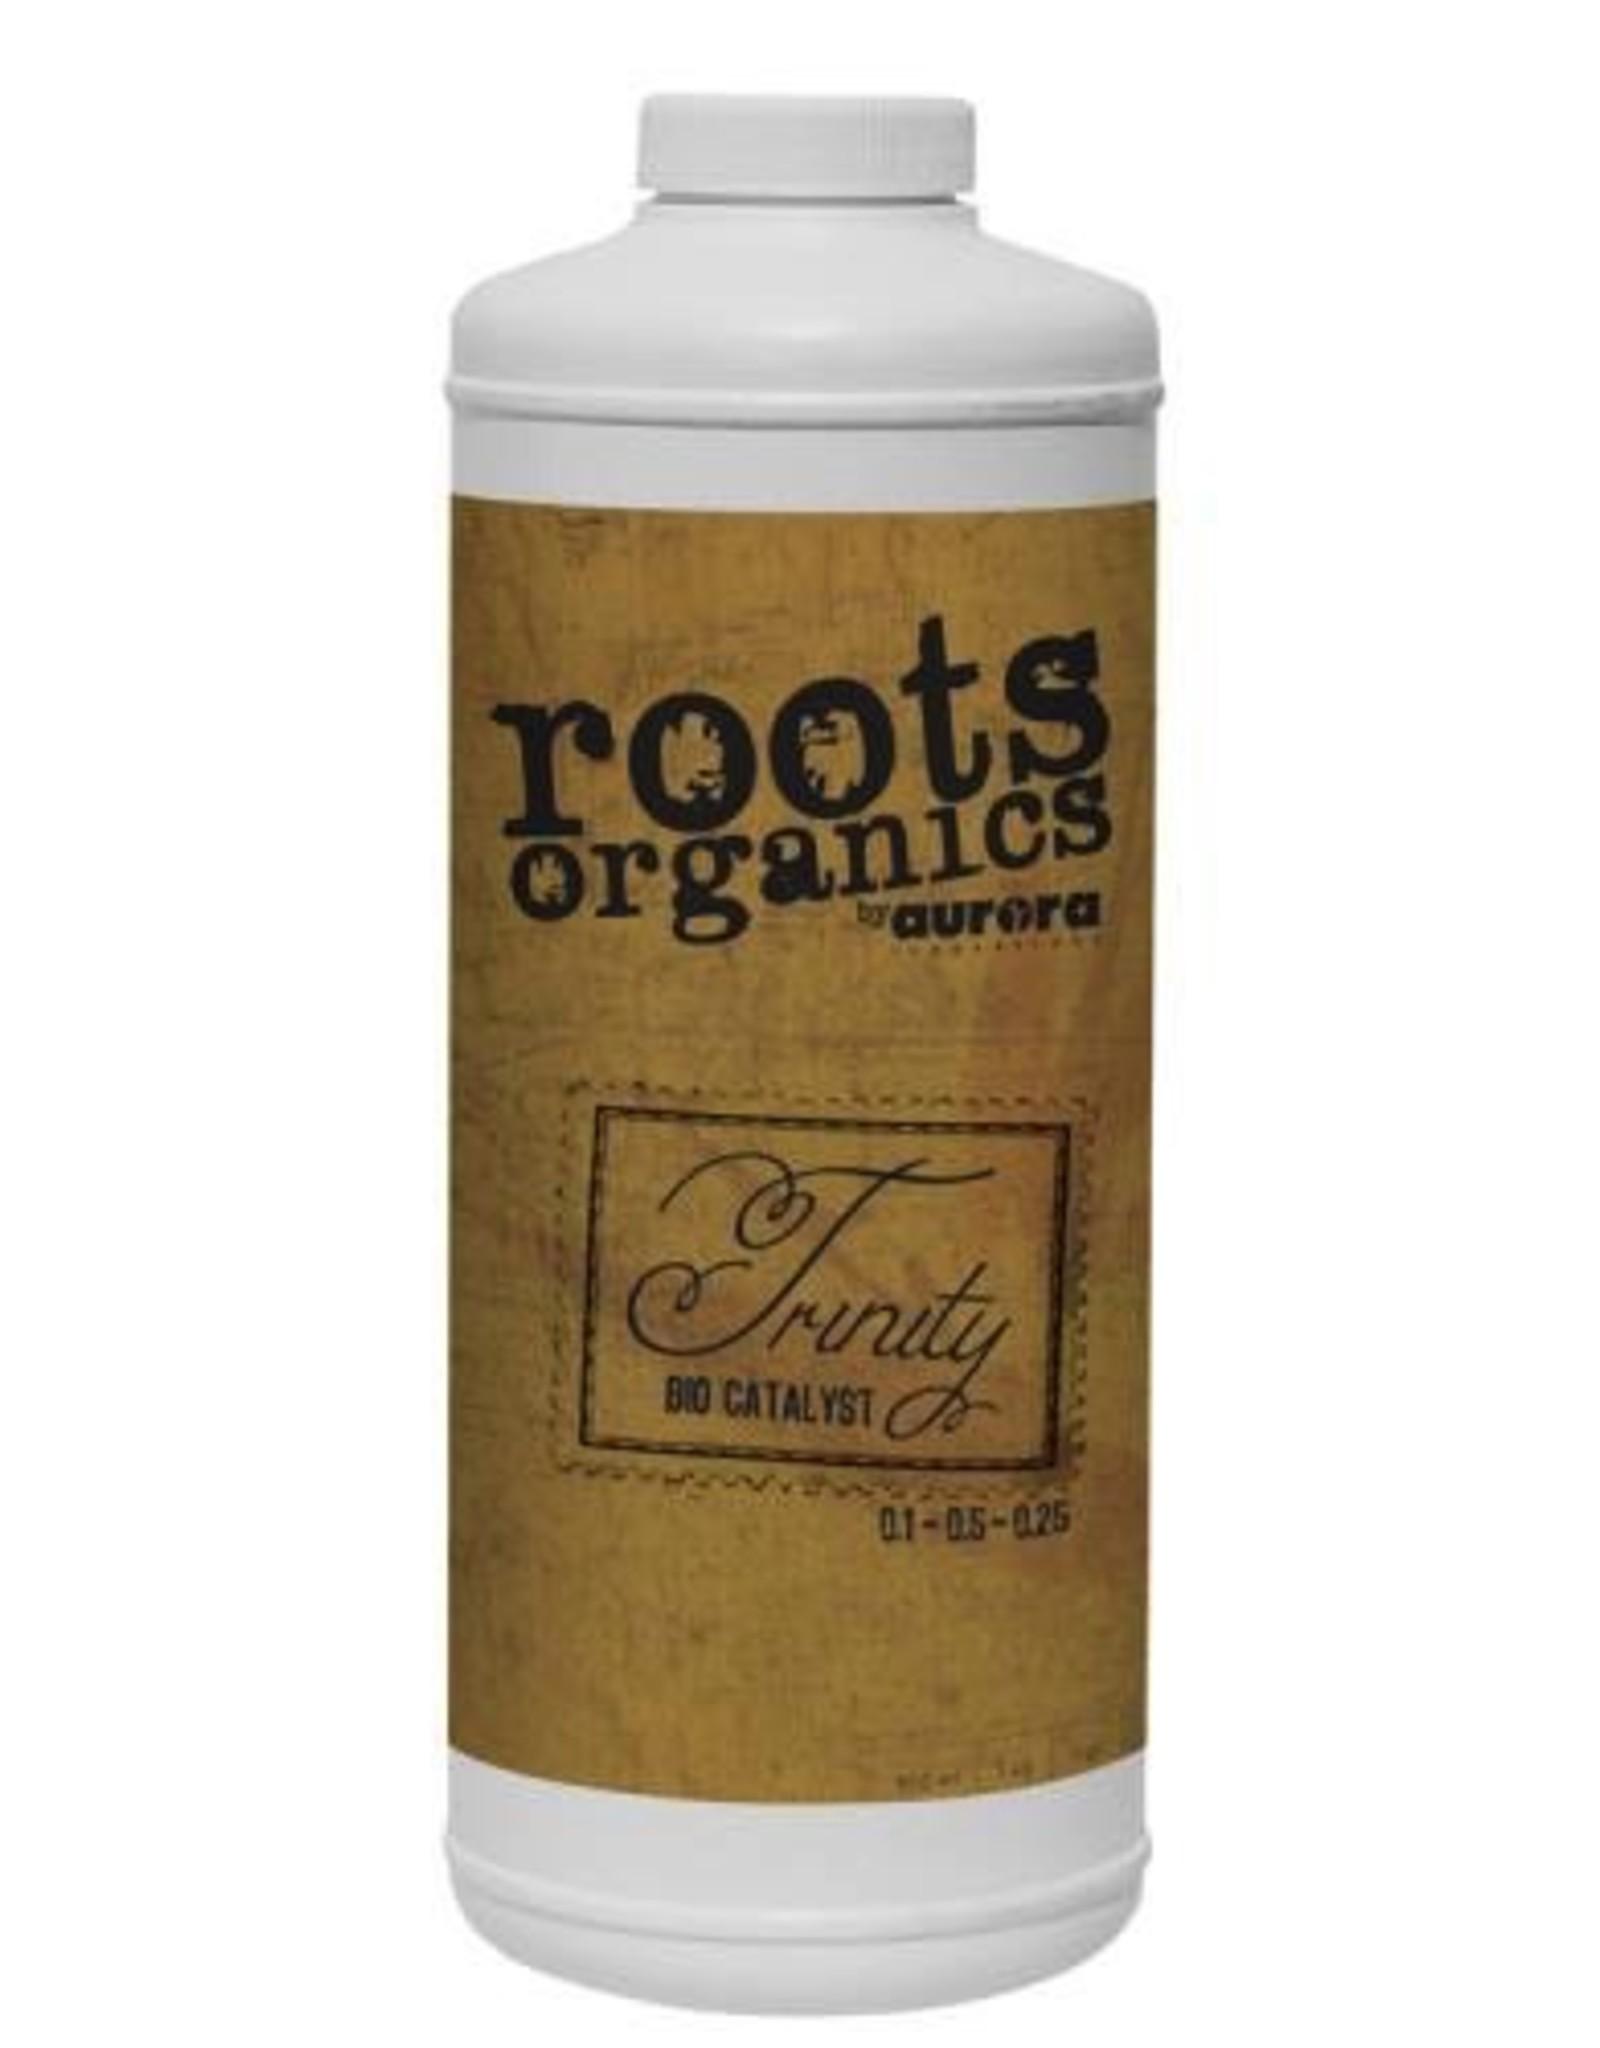 AURORA INNOVATIONS Roots Organics Trinity Carbo Catalyst, 1 qt